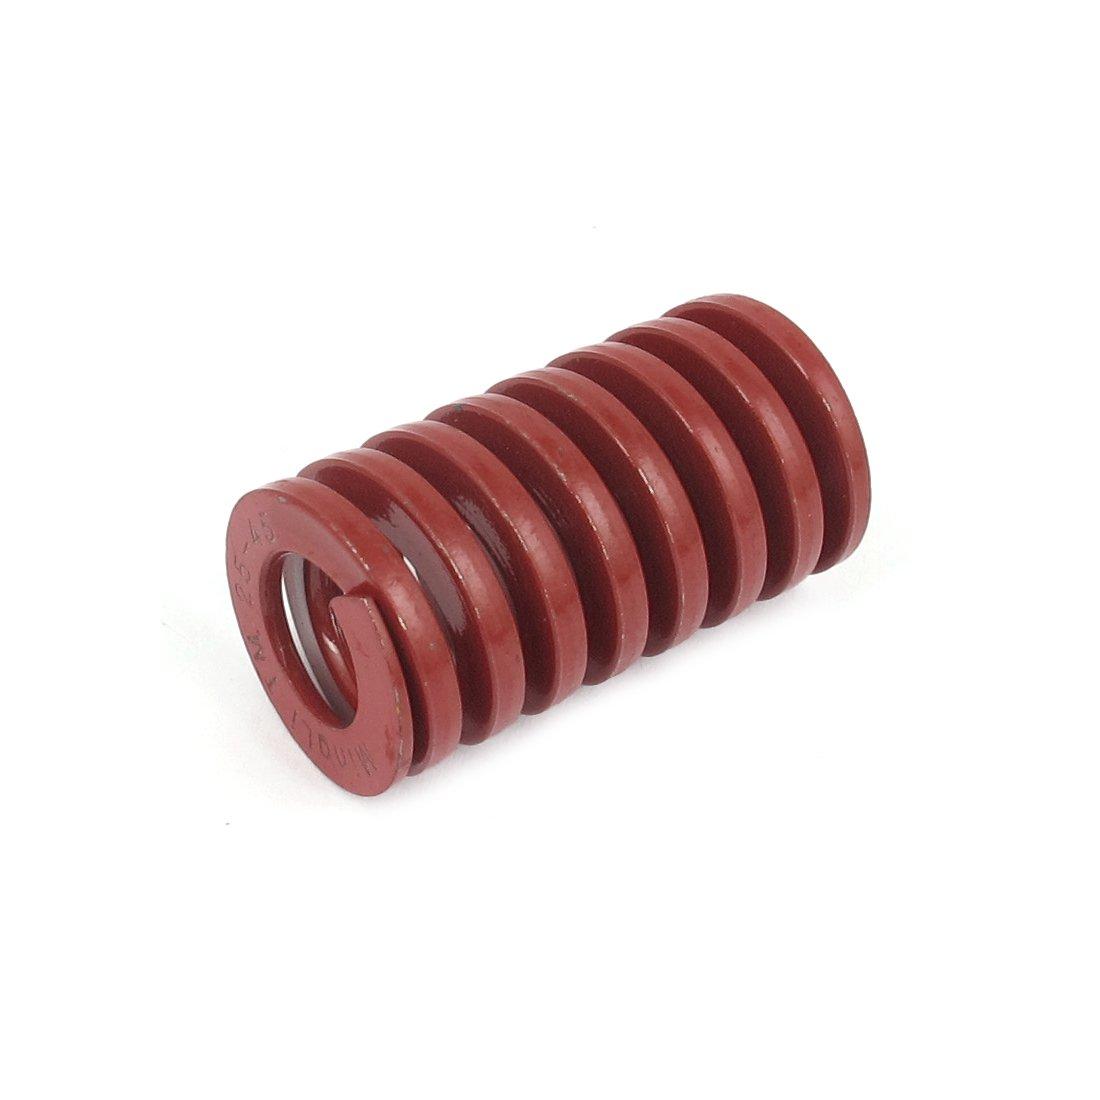 uxcell a15102700ux0552 25 mmx45 mm chrom Legierung Stahl mittel Laden sterben Spring rot, Nylon